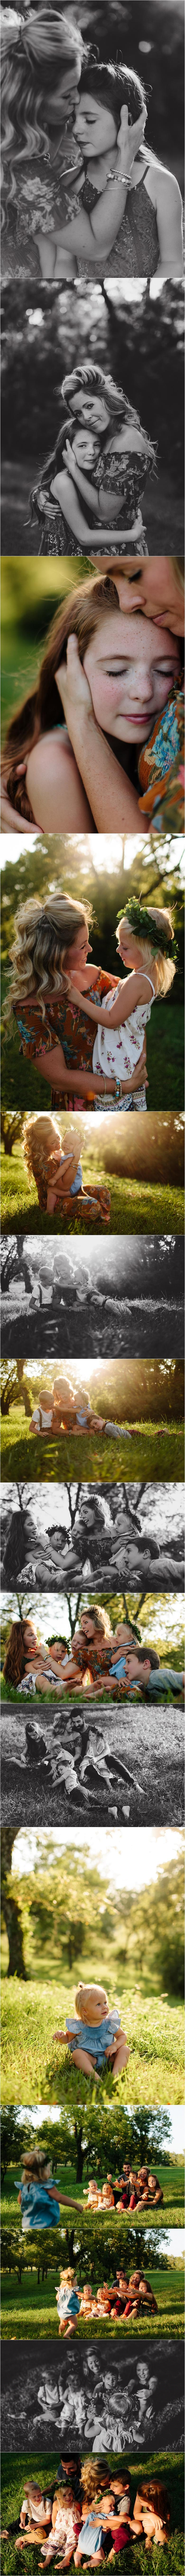 wildflowersphotos_0002